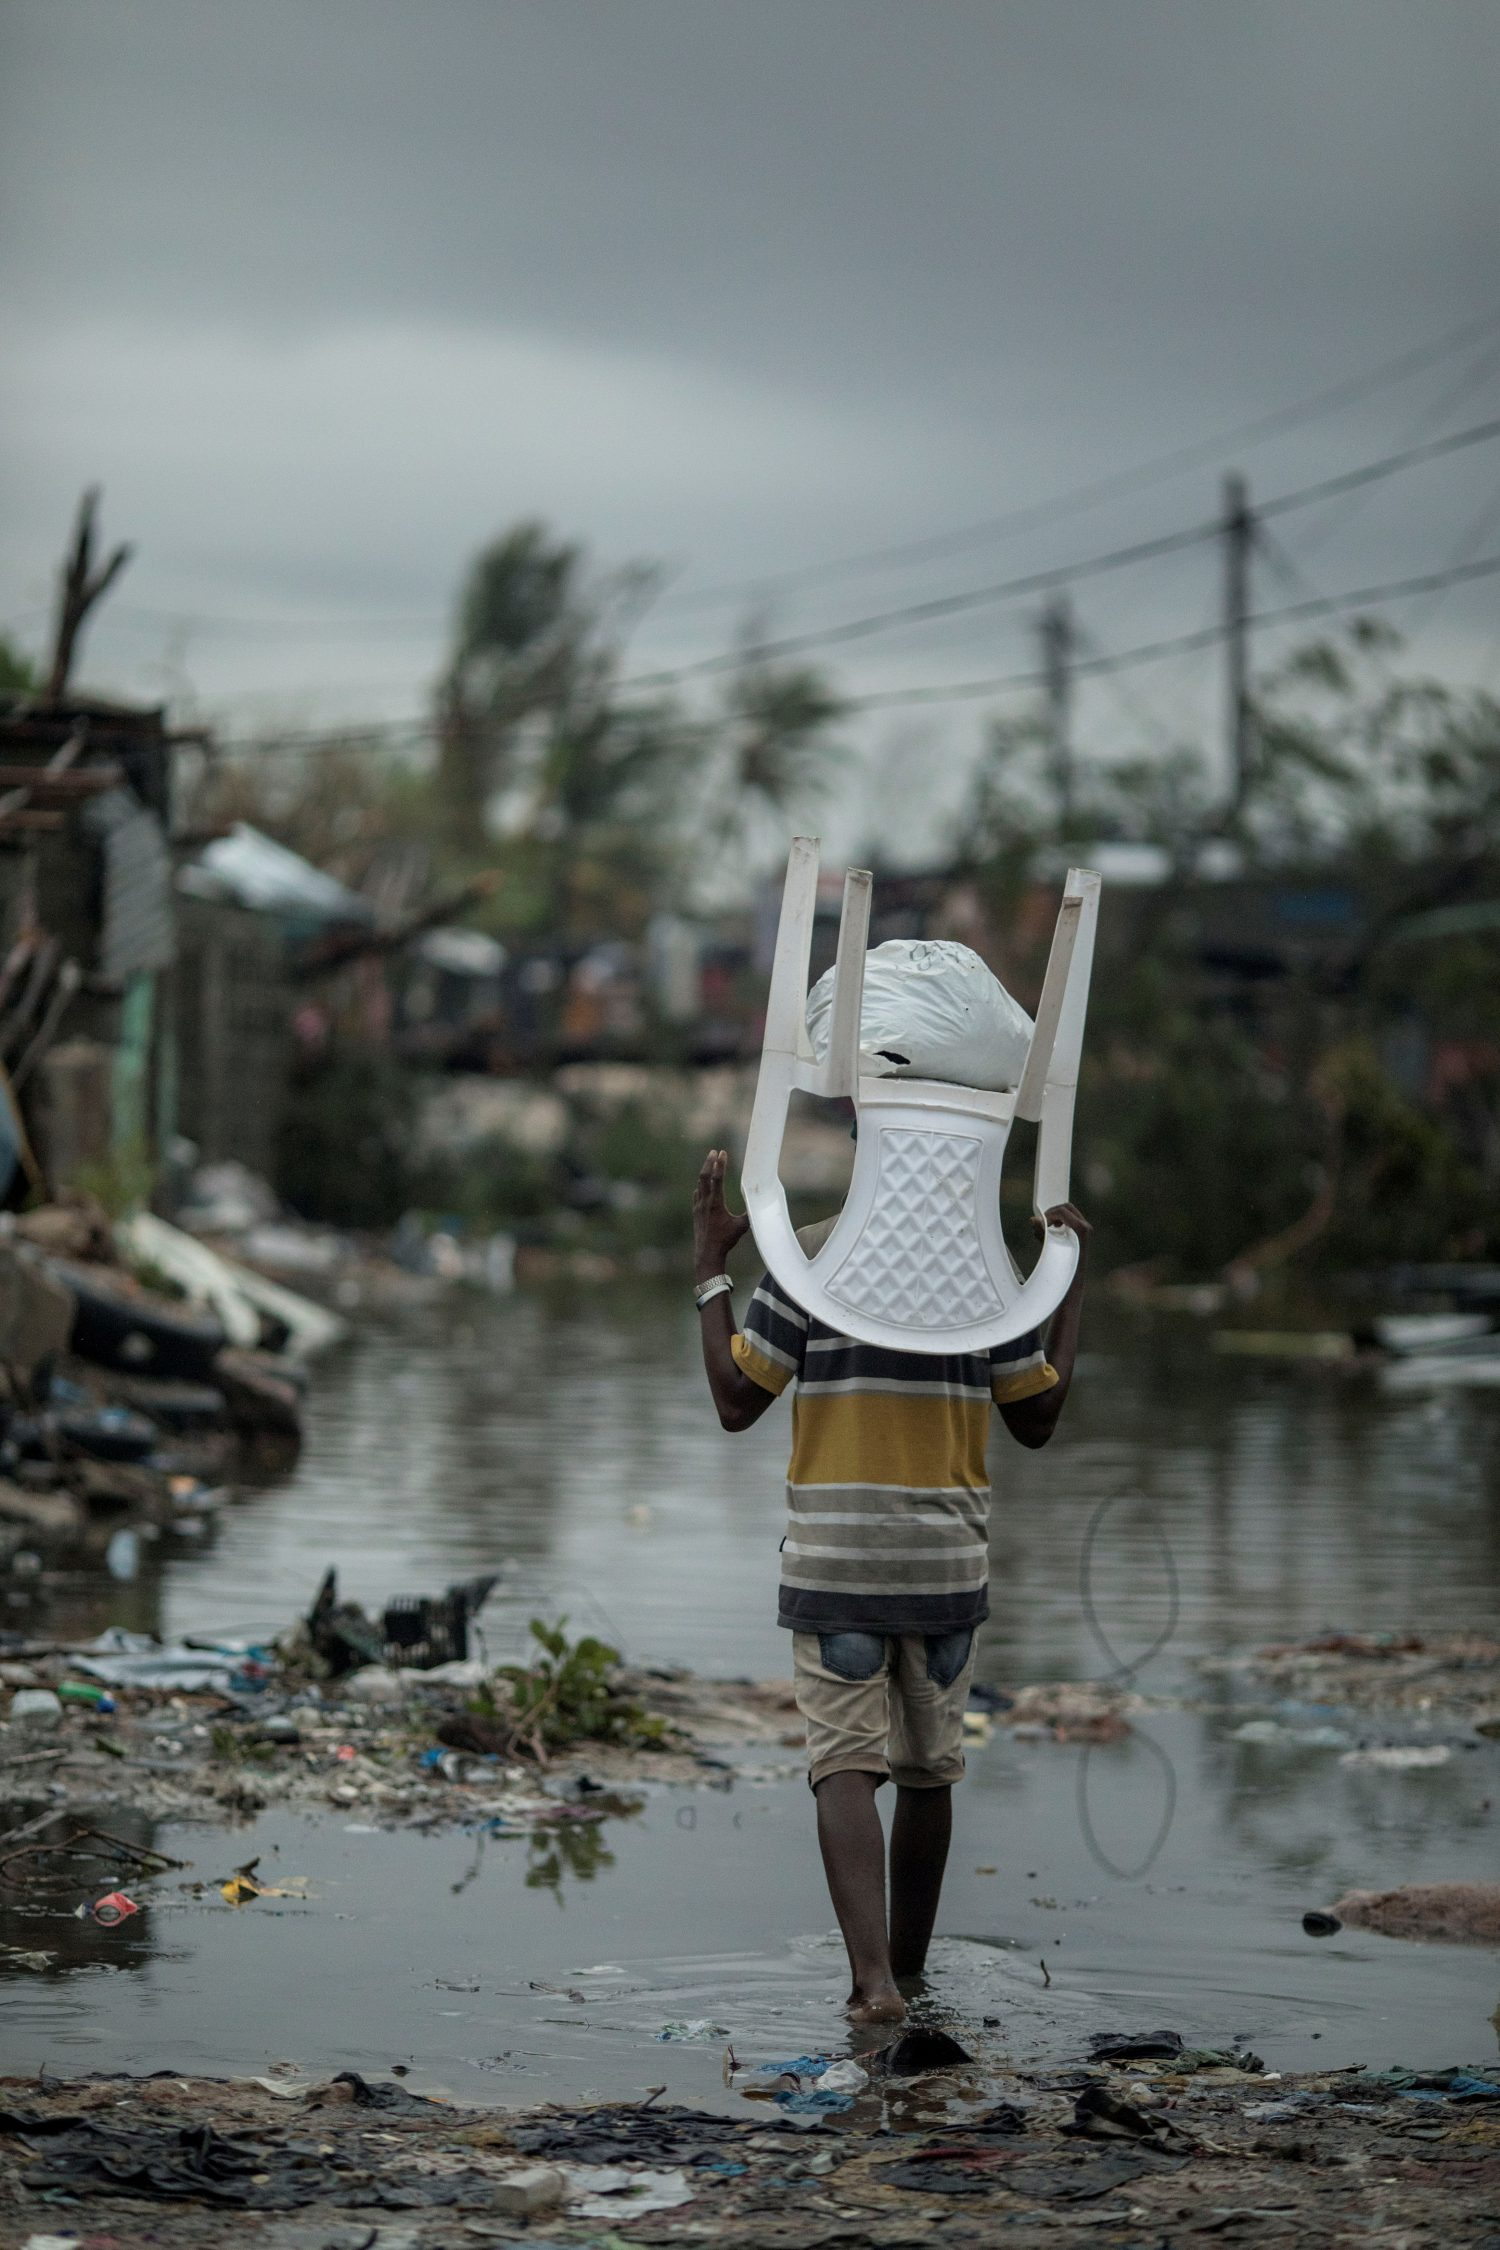 People return to Praia Nova Village neighborhood following Cyclone Idai in Beira, Mozambique, March 17, 2019. Josh Estey/Care International via REUTERS